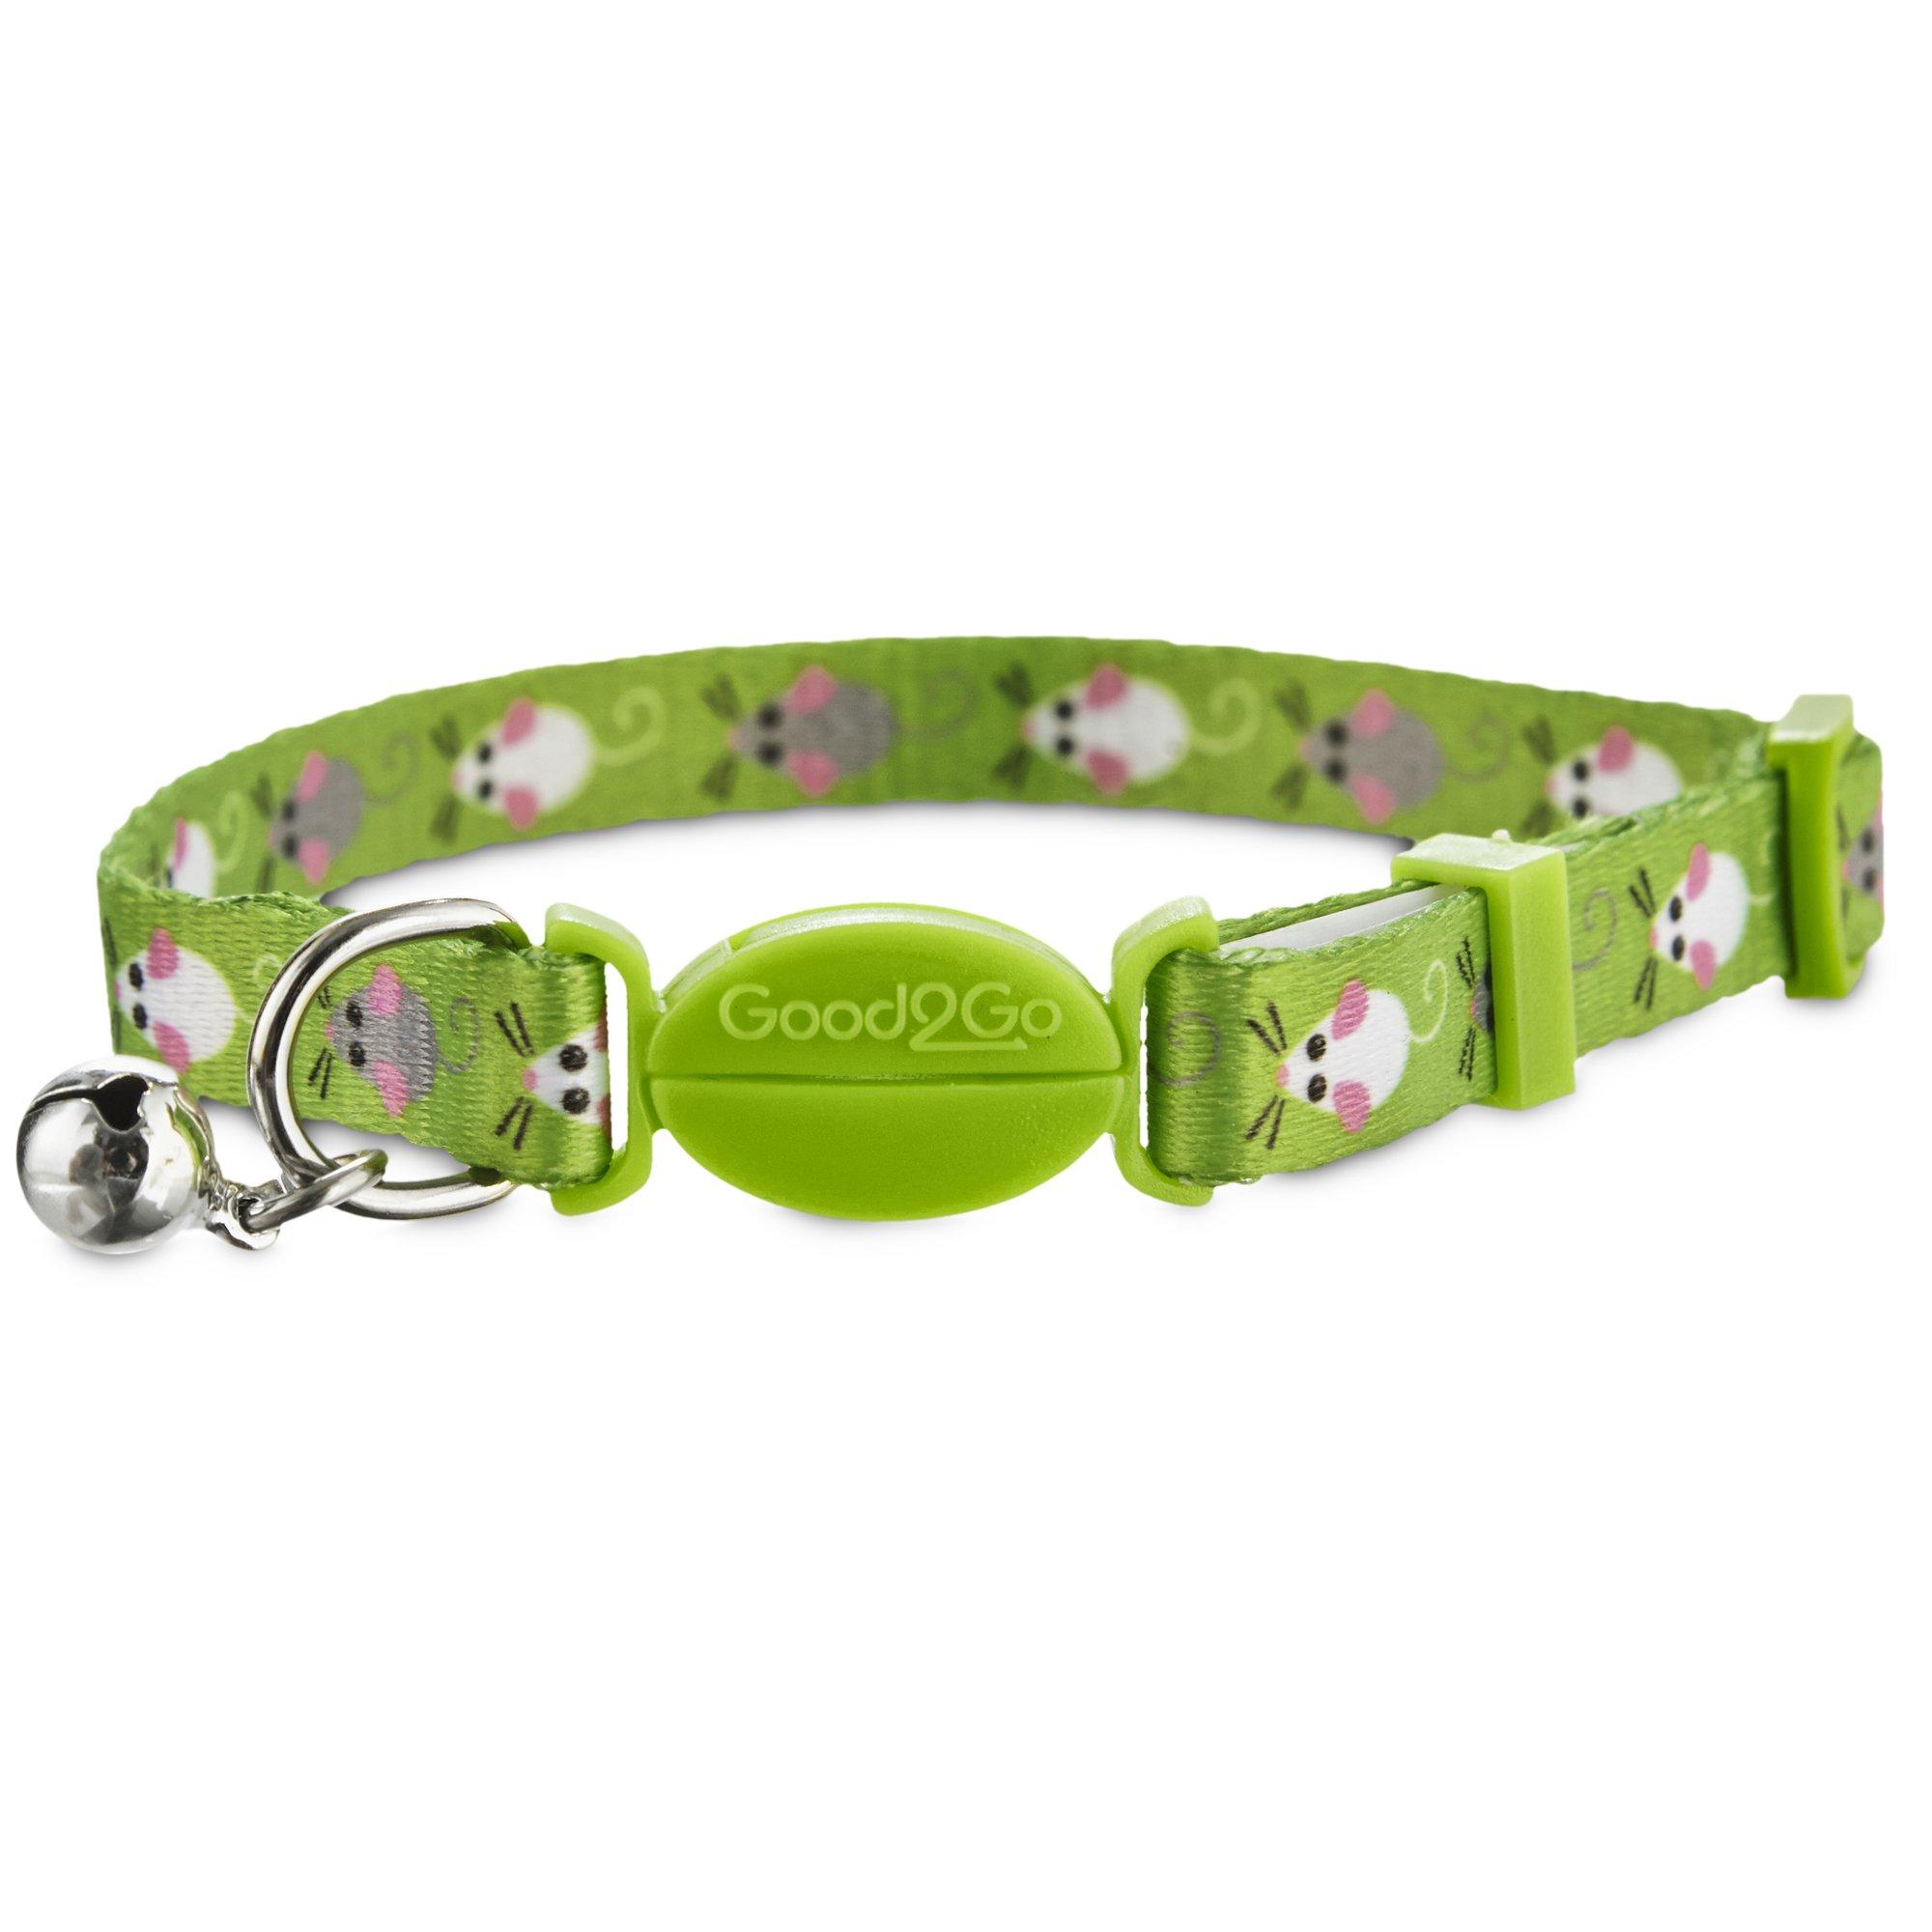 Good2Go Green Mouse Print Cat Collar